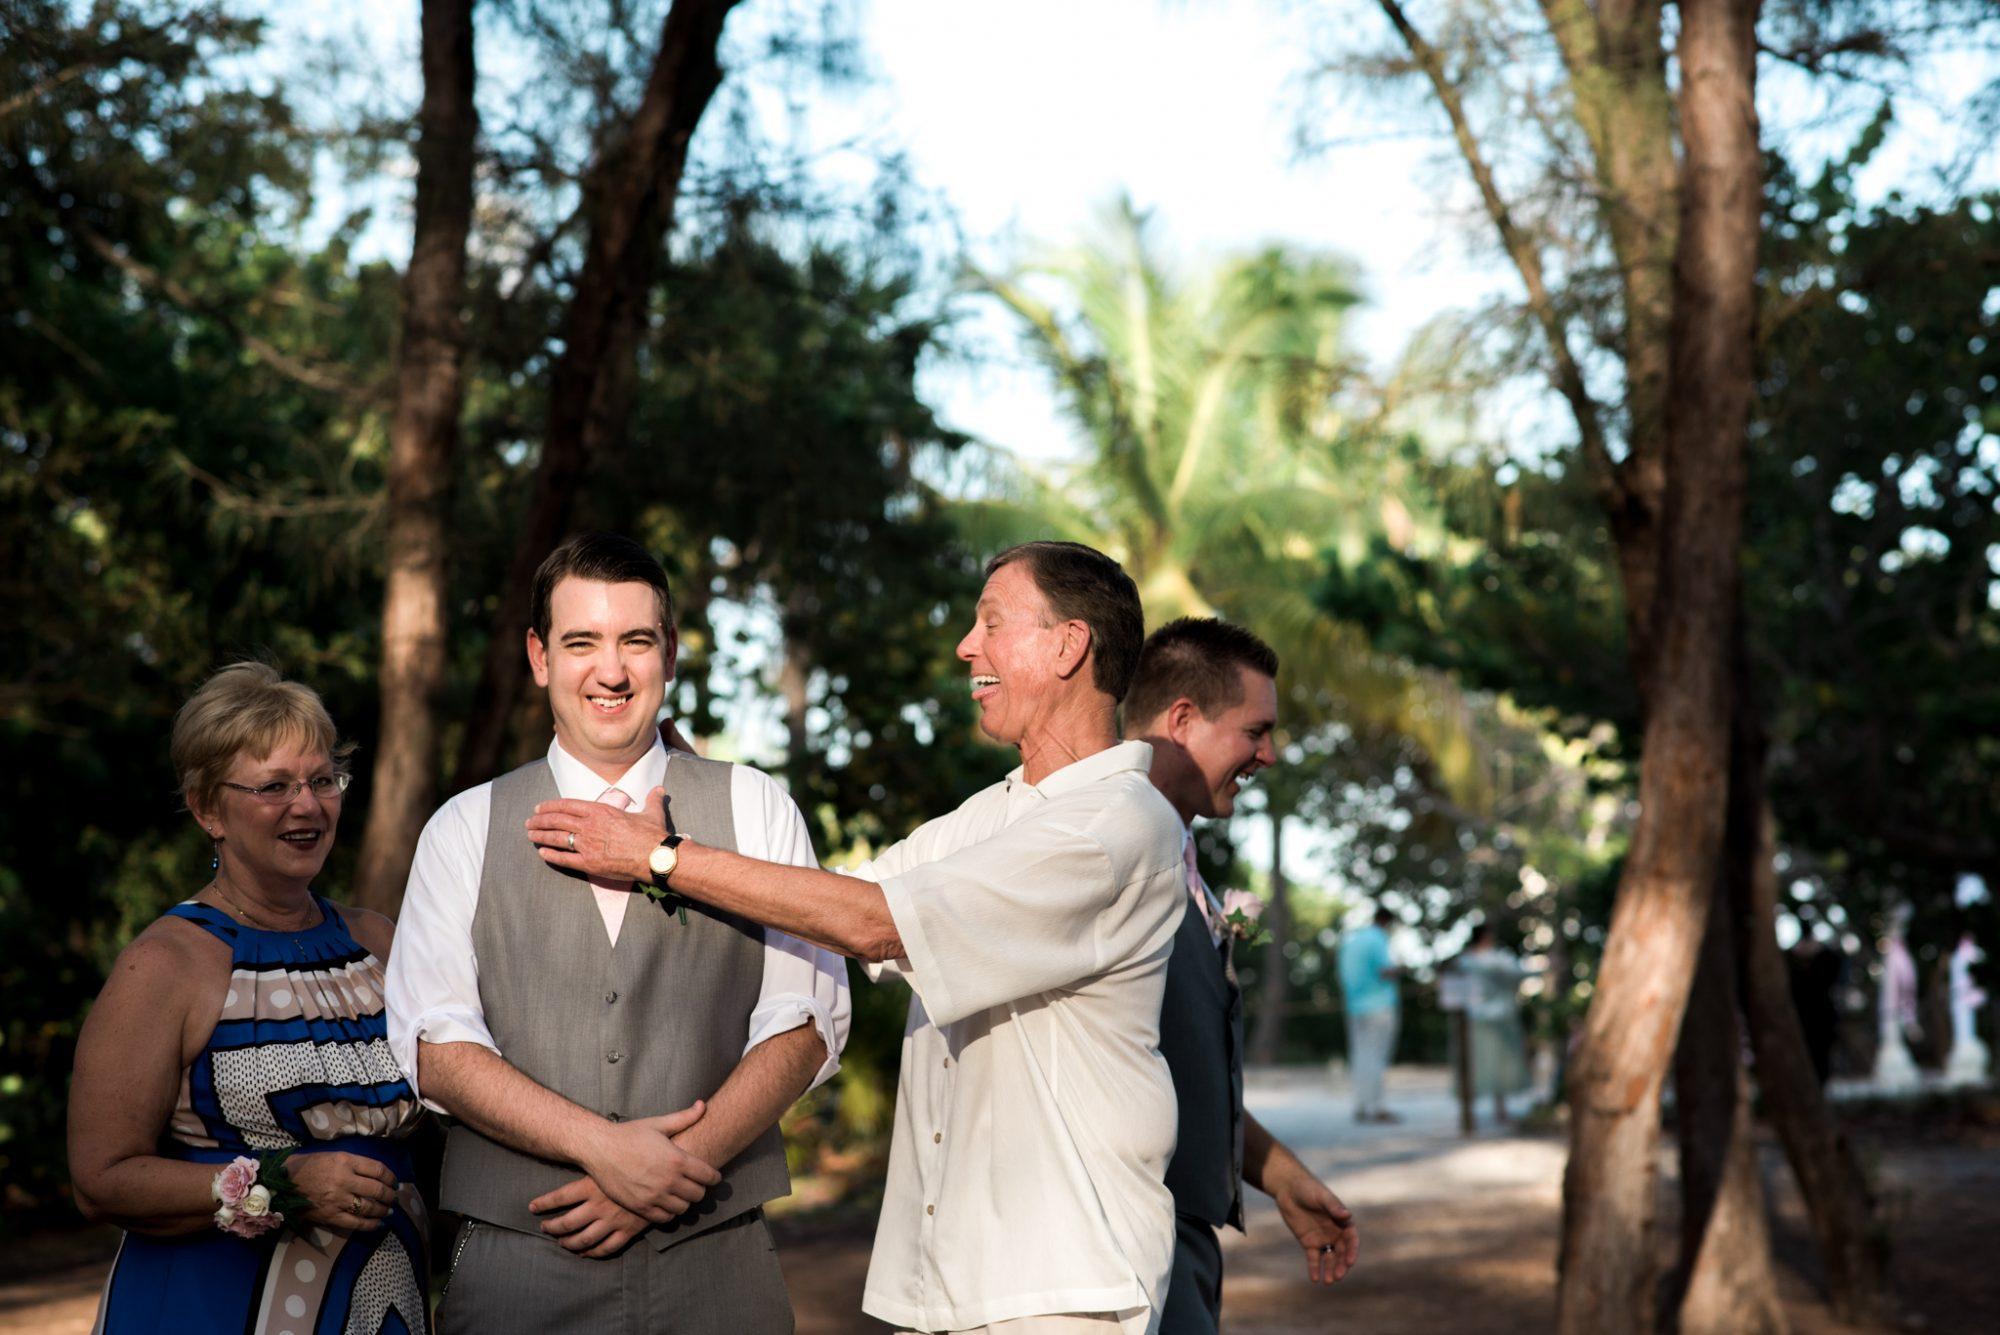 Heather Jeff Key West Wedding Photographer Fort Zachary Taylor 13 - Heather & Jeff - Key West Wedding Photographer - Fort Zachary Taylor